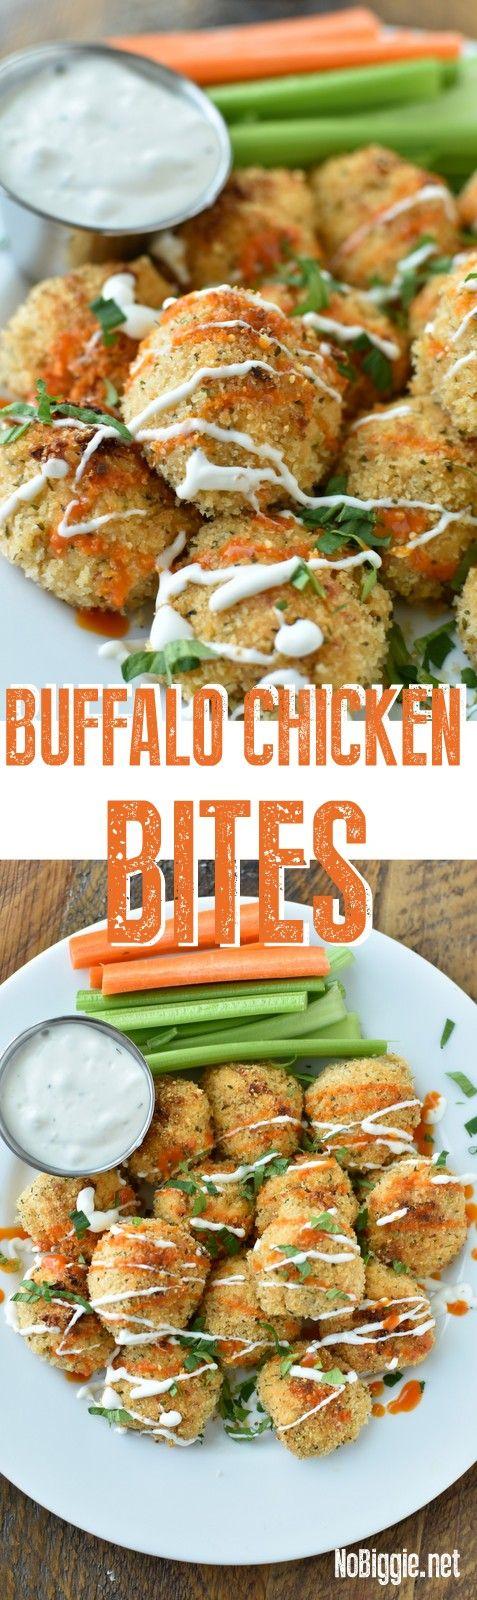 buffalo chicken bites | NoBiggie.net